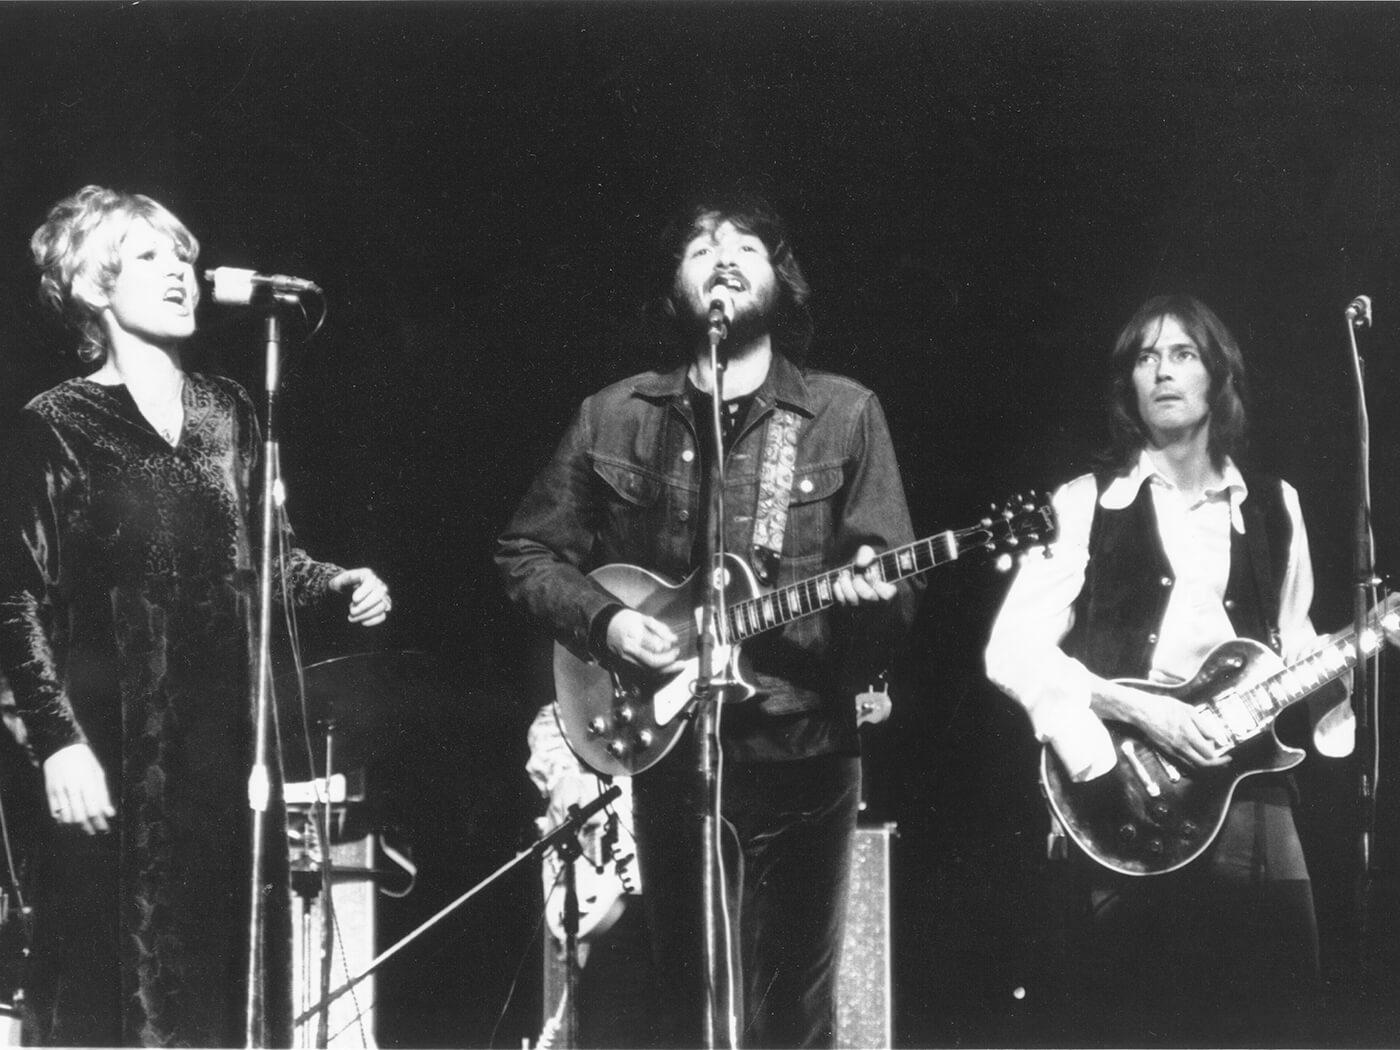 Eric Clapton, Delaney Bramlett, Bonnie Bramlett